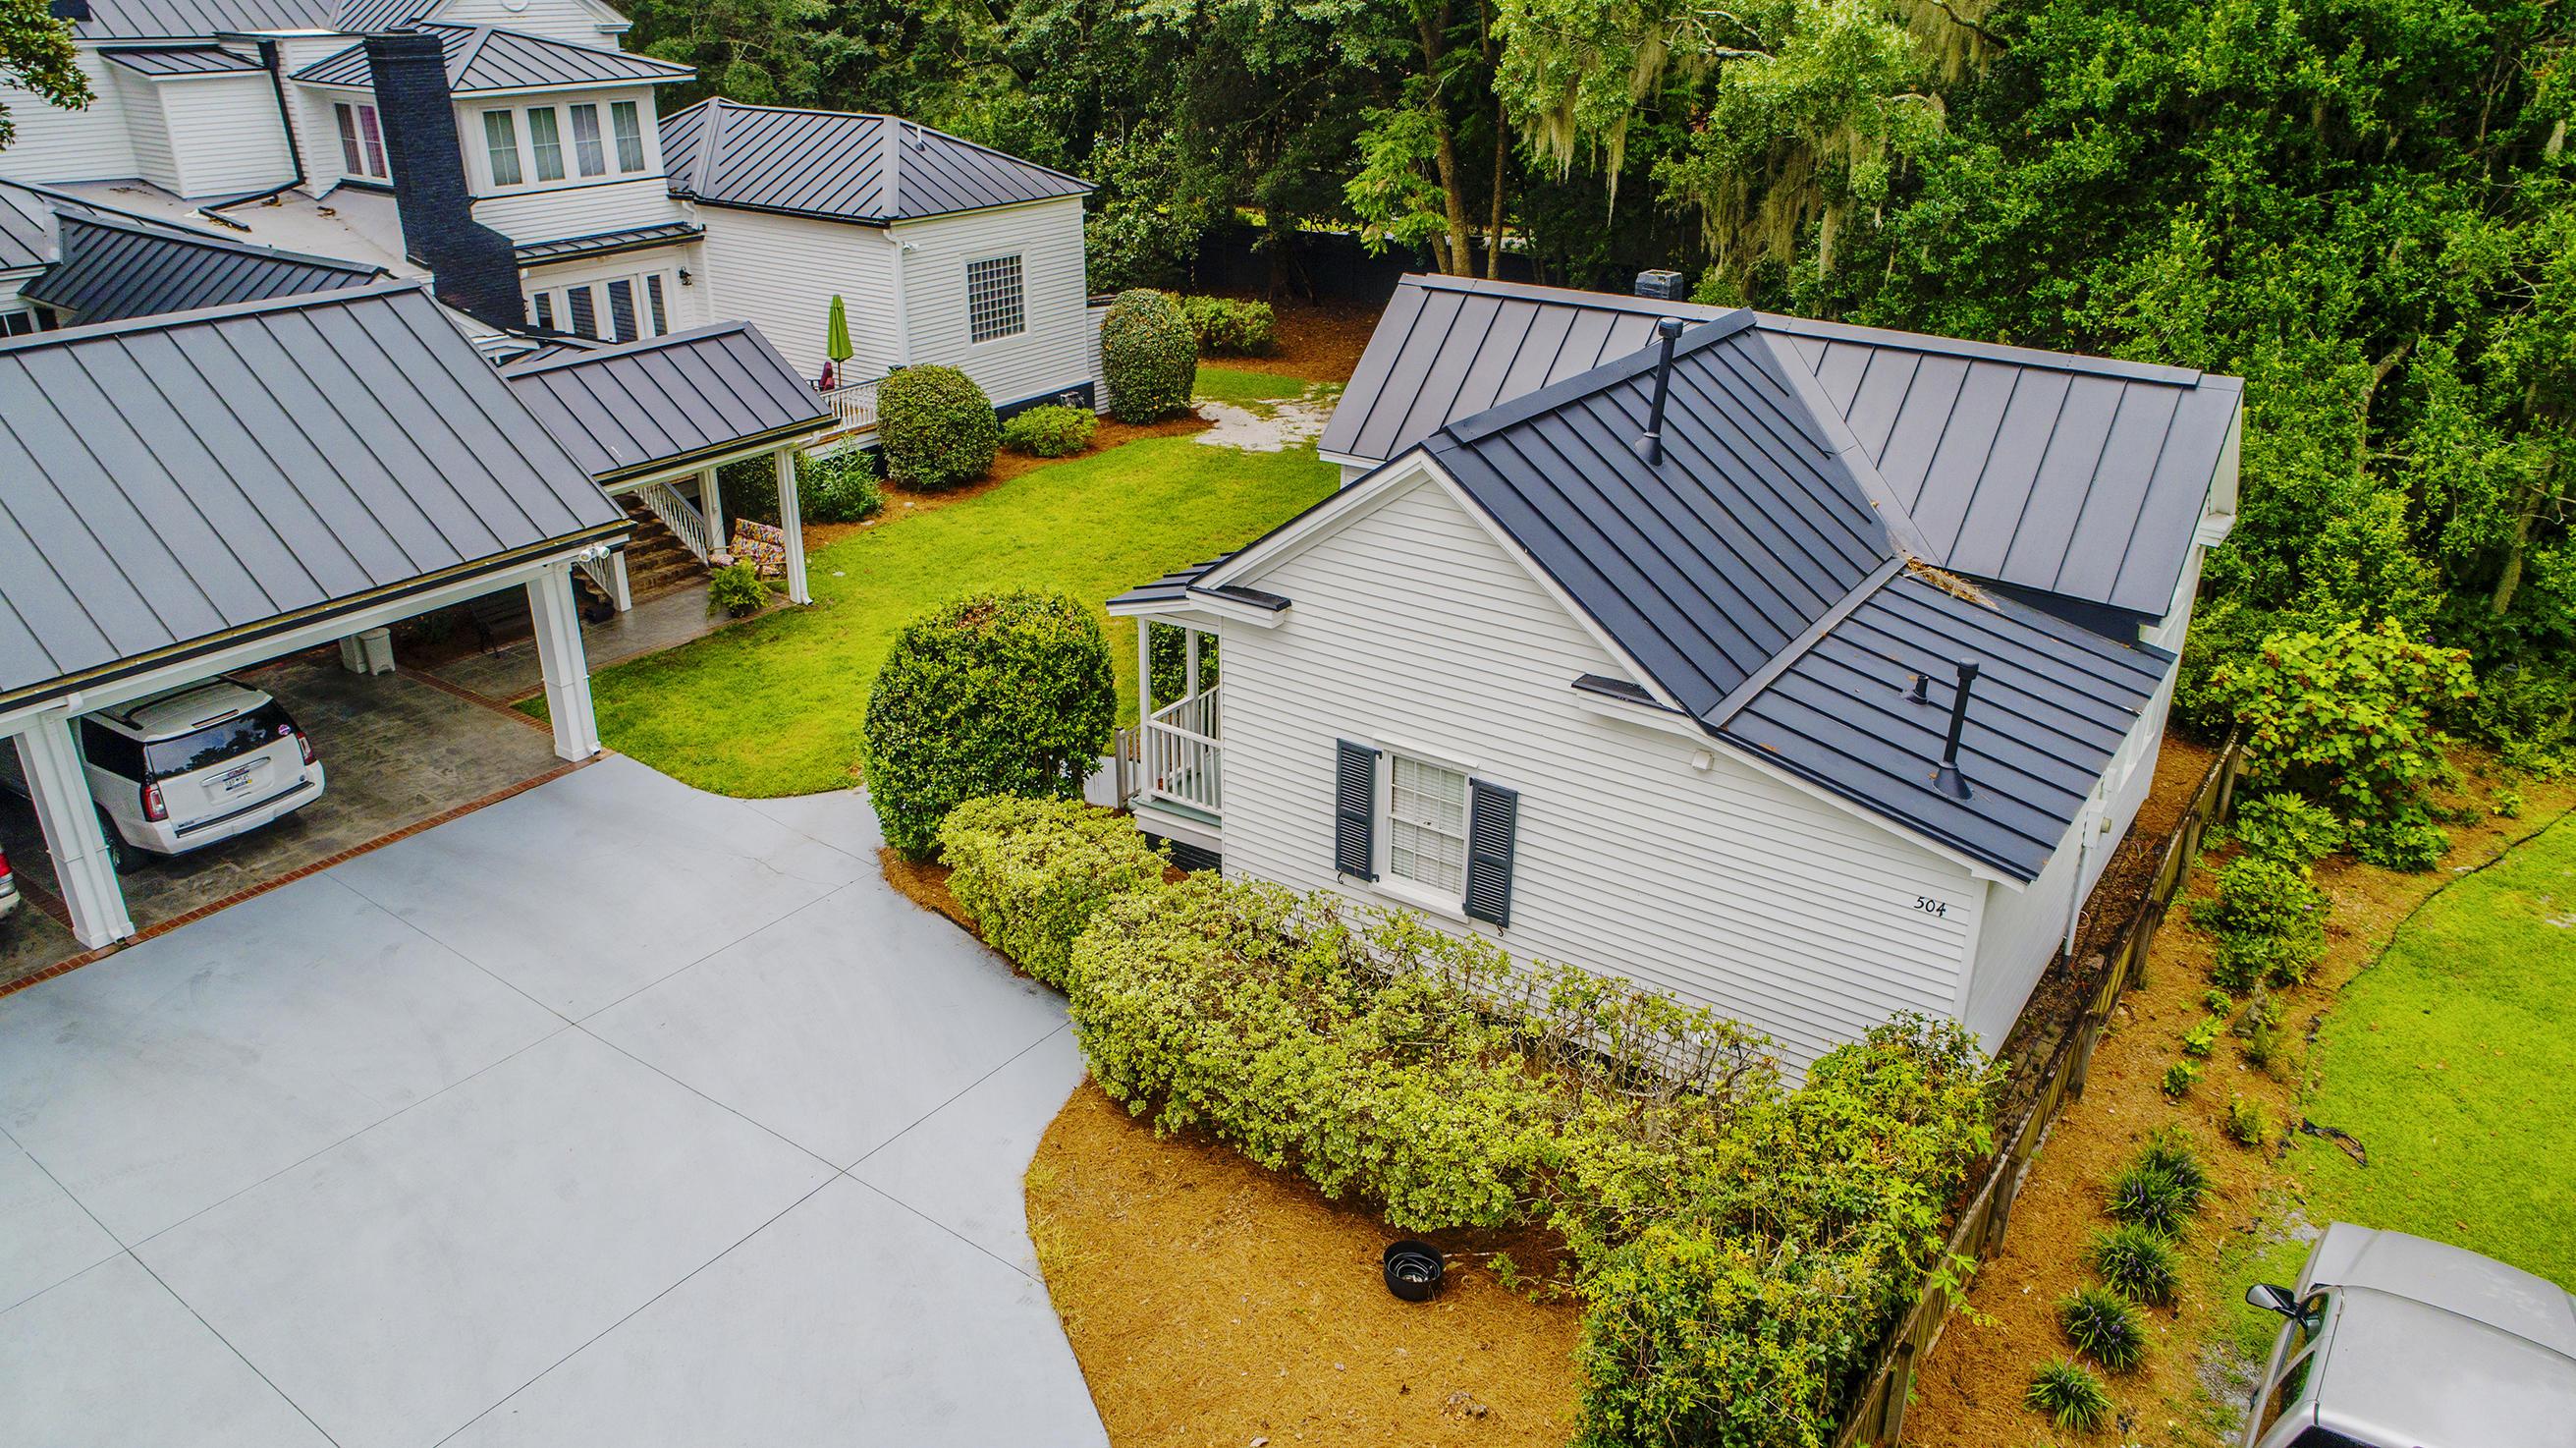 Summerville Homes For Sale - 102 Hickory, Summerville, SC - 72